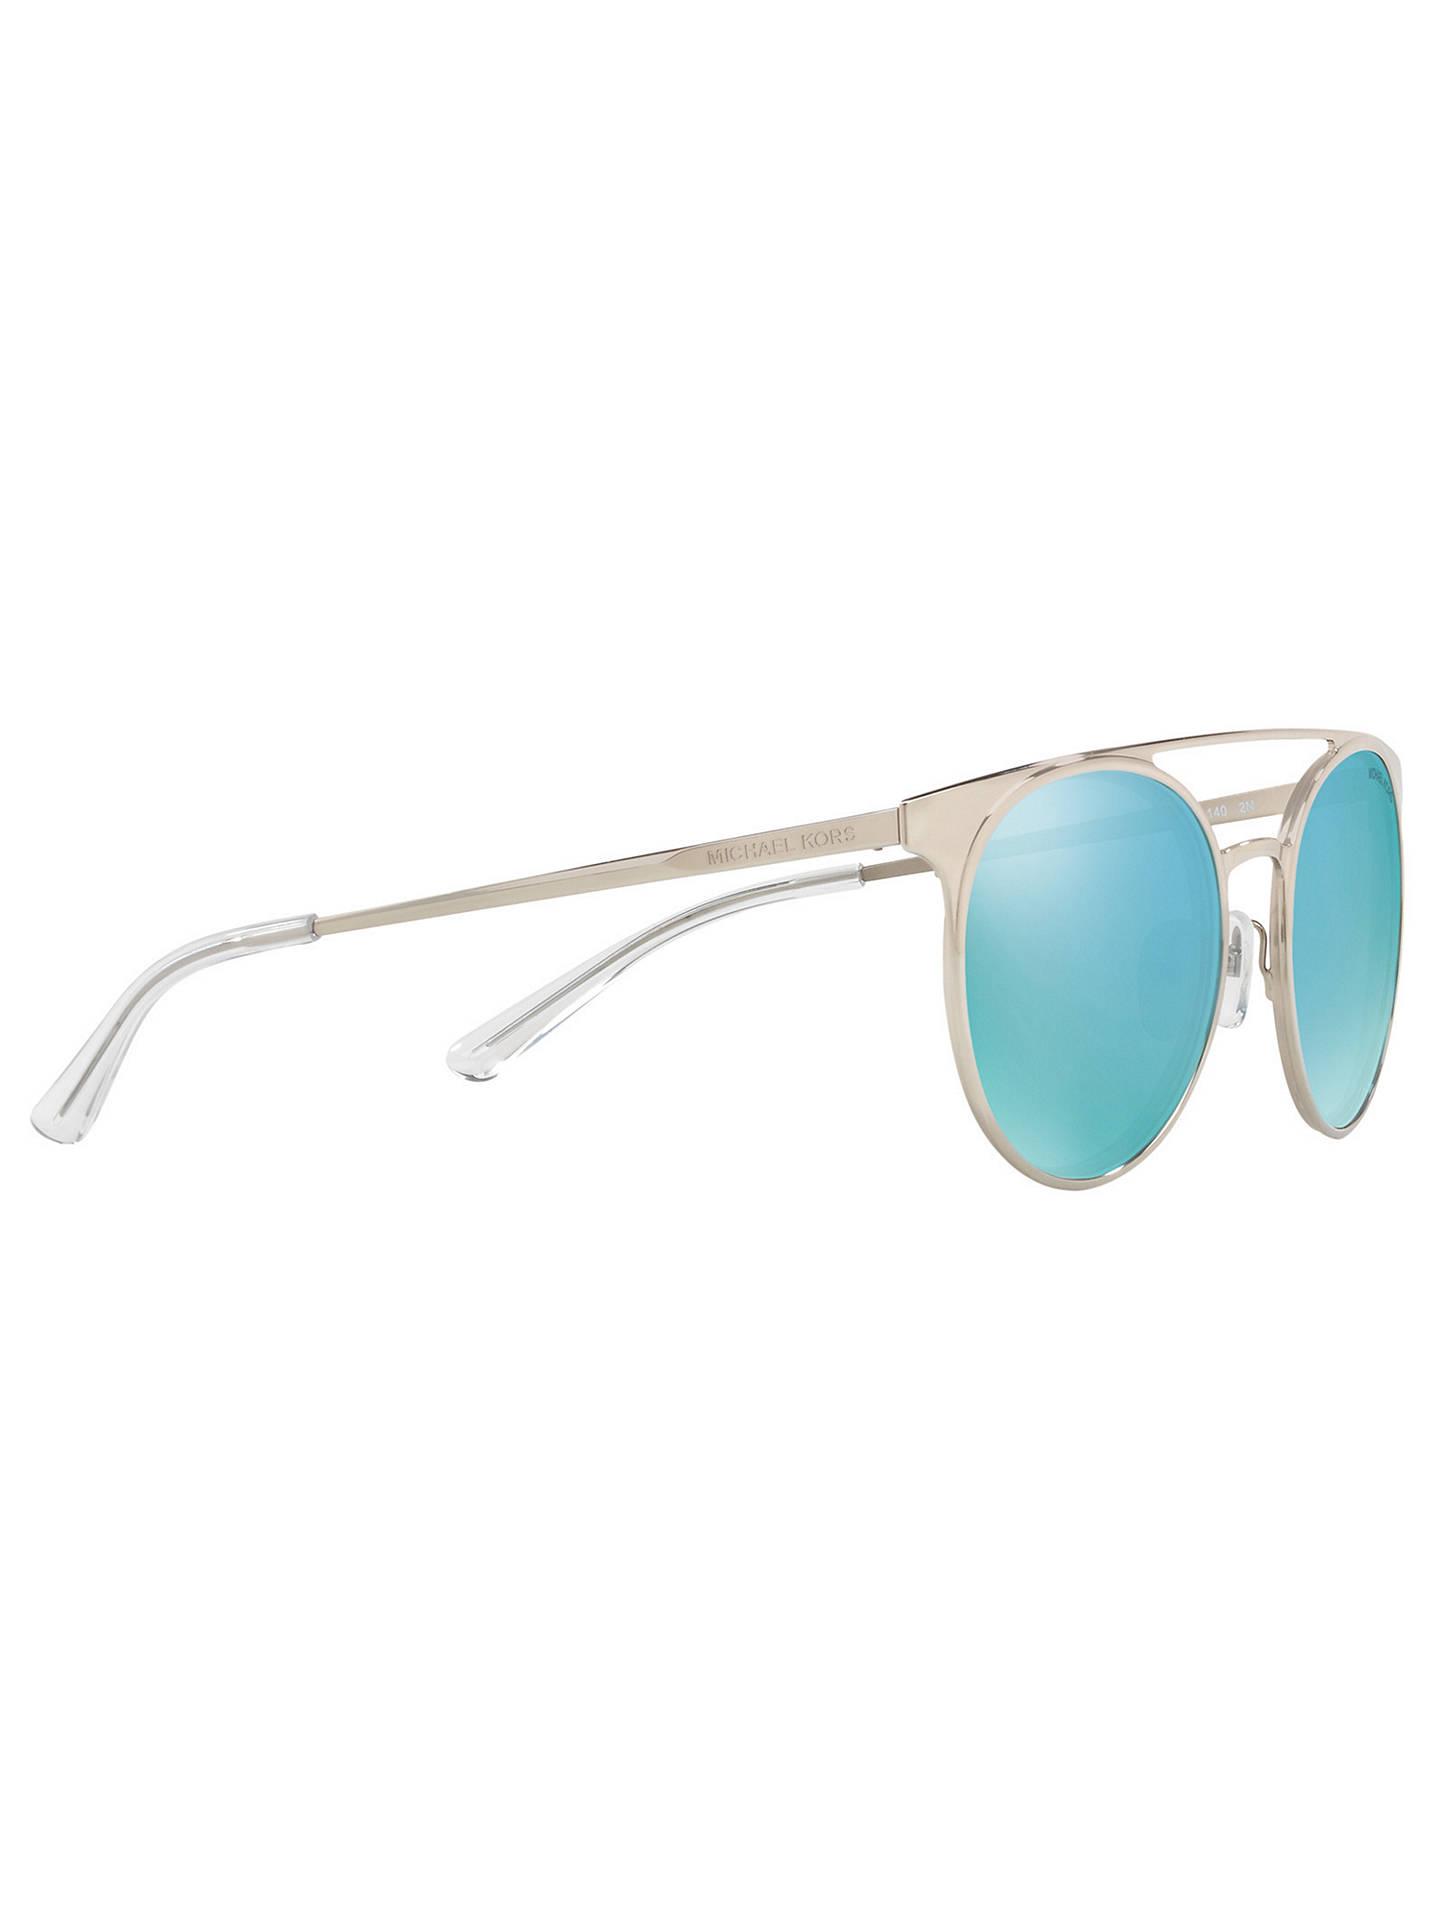 3826035887 ... Buy Michael Kors MK1030 Women s Grayton Round Sunglasses